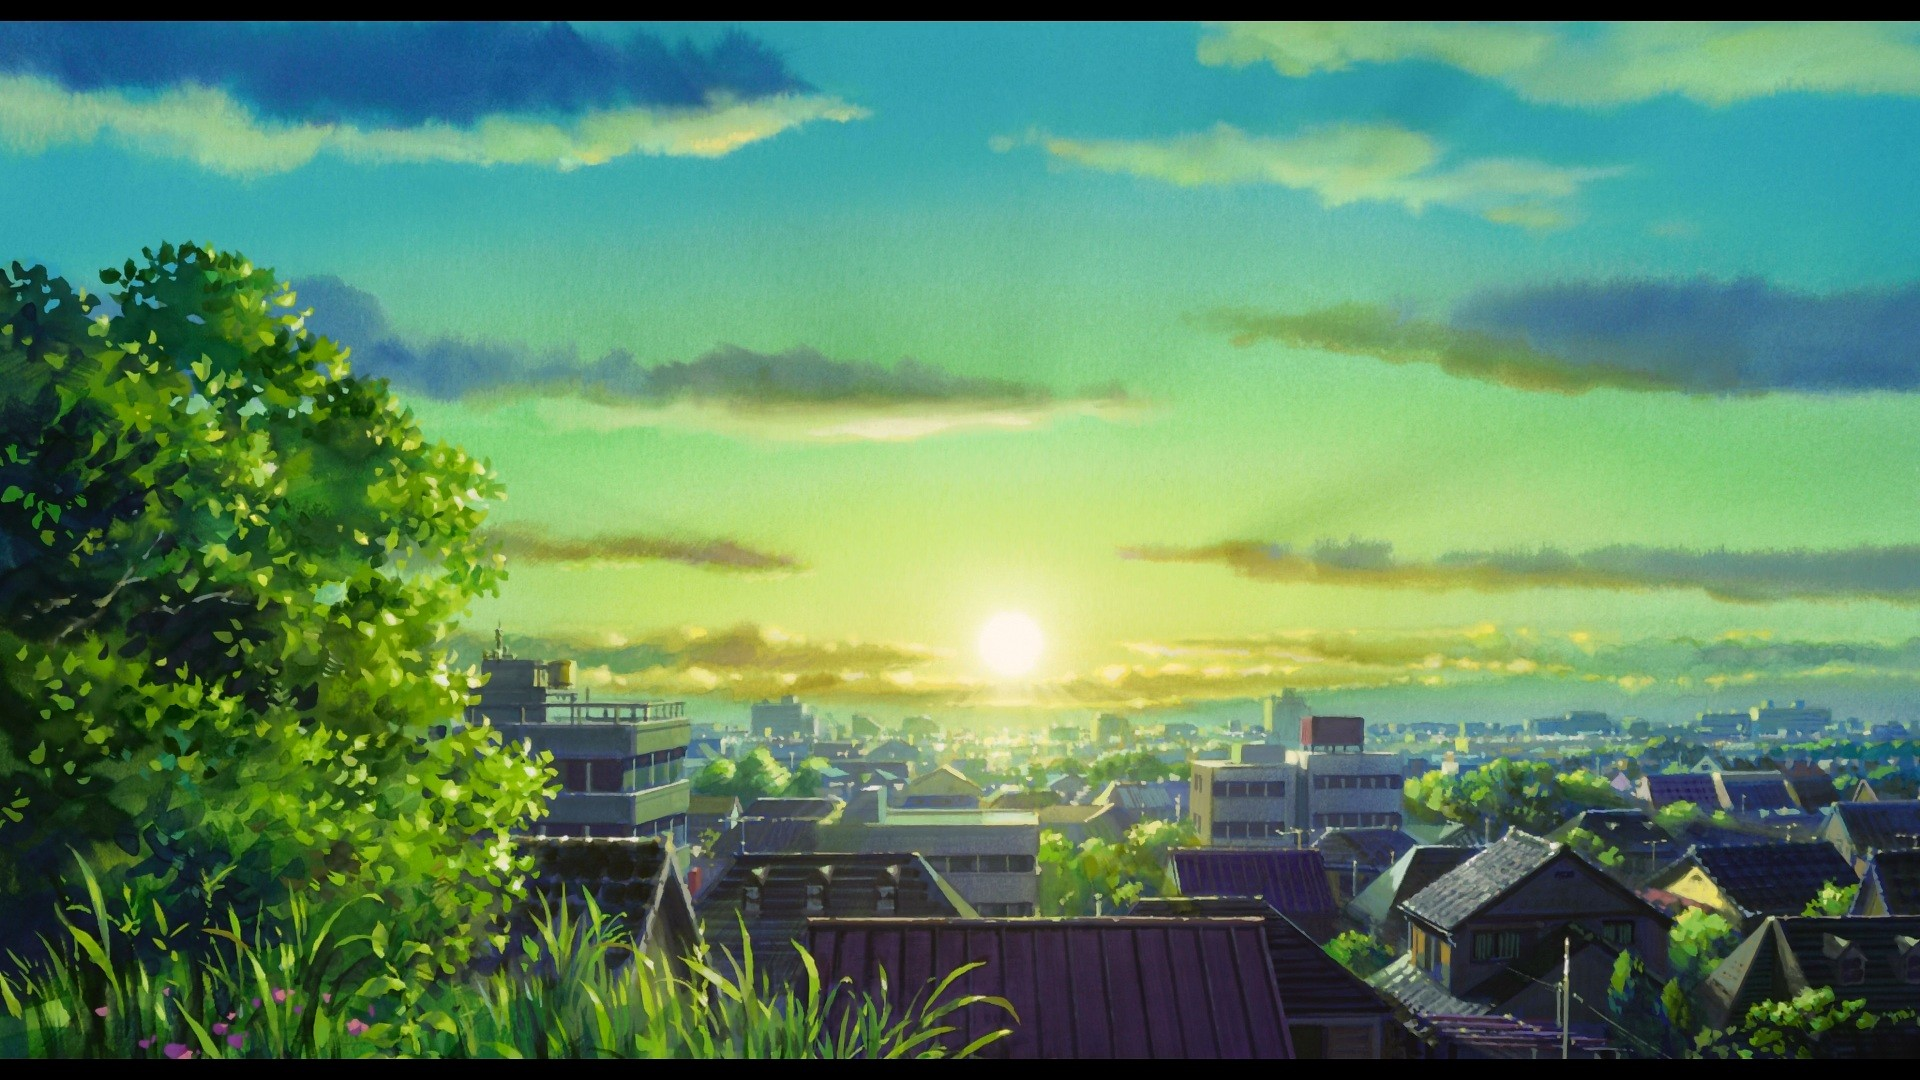 sunlight-landscape-cityscape-anime-sky-evening-morning-Sun-horizon-town-atmosphere-cloud-plain-screenshot-computer-wallpaper-239716